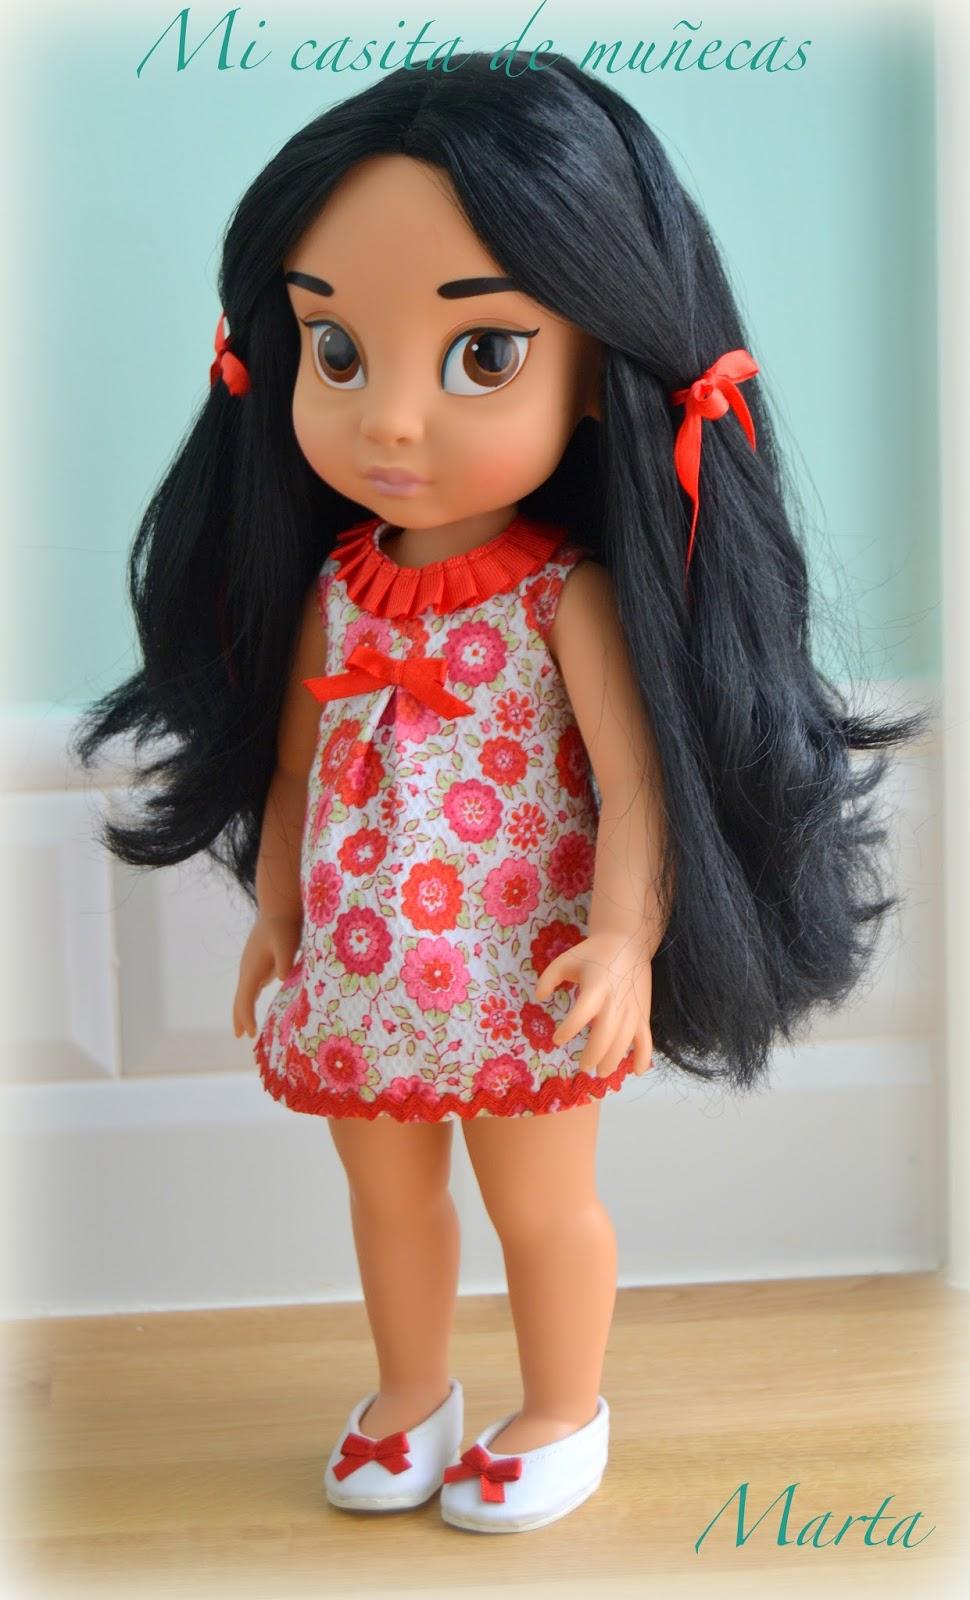 Jasmine Animators Disney Store, Jazmin, Yasmin, Yazmin. Vestido y zapatos.